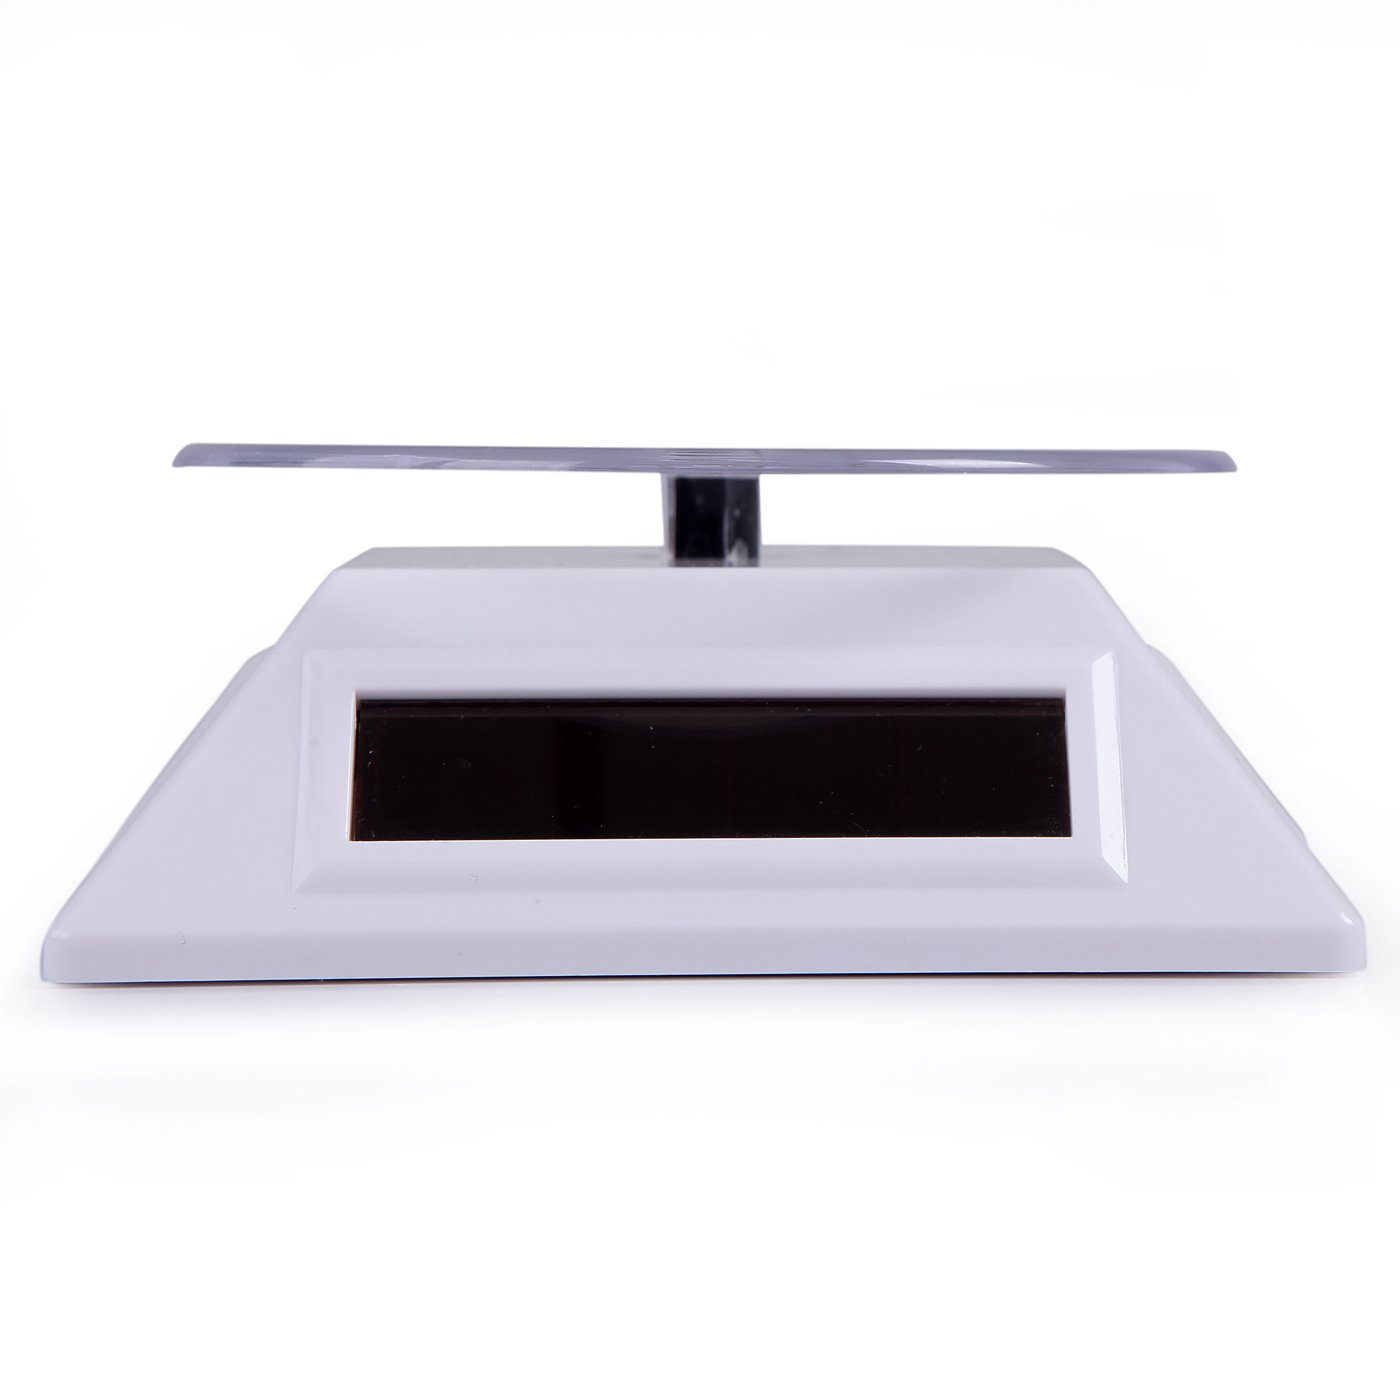 Amazoncom Hde ( ) Rotating Mini Display Stand  Solar